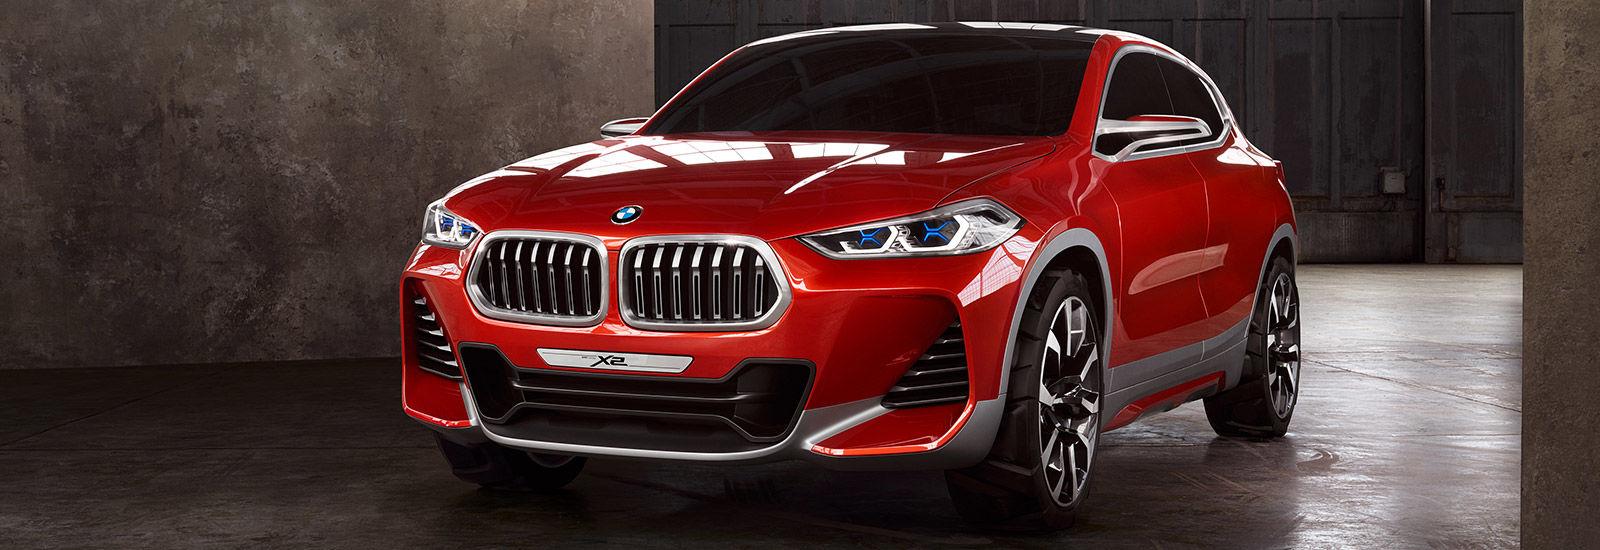 BMW X2 Motori | Gamma motorizzazioni Diesel e Benzina